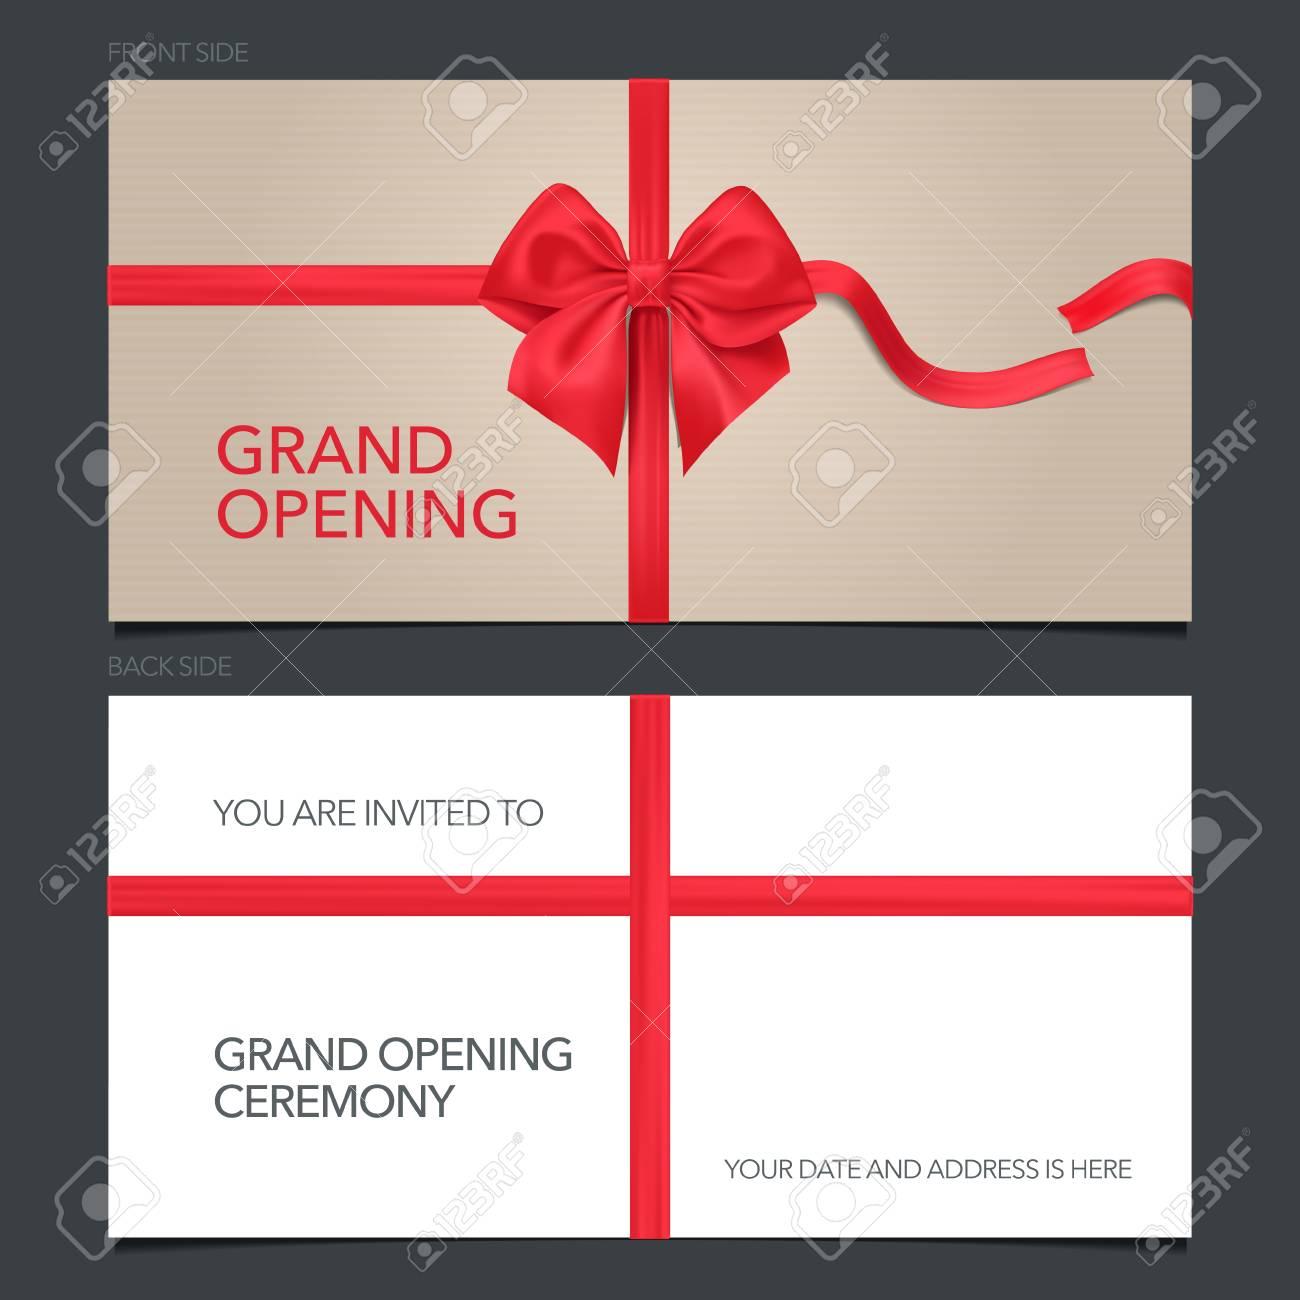 Grand Opening Vector Illustration Invitation Card Template